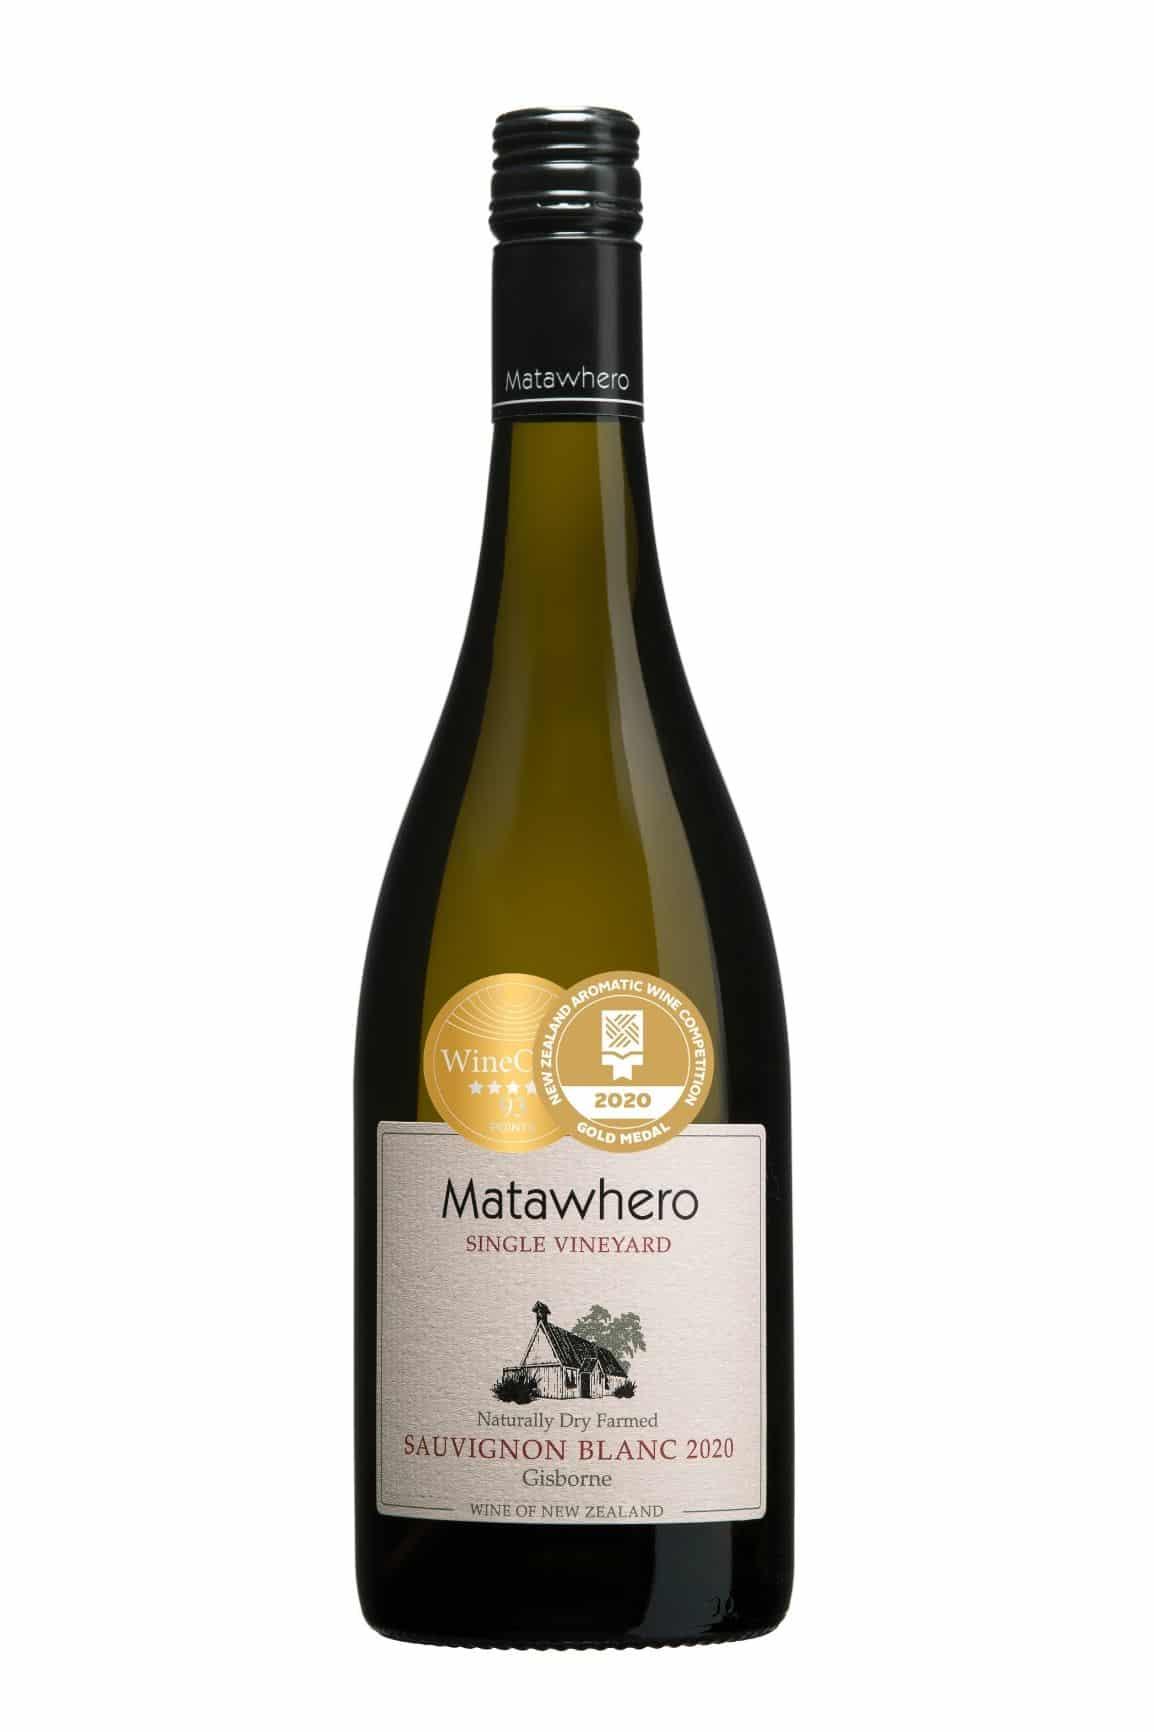 Single Vineyard Sauvignon Blanc 2020